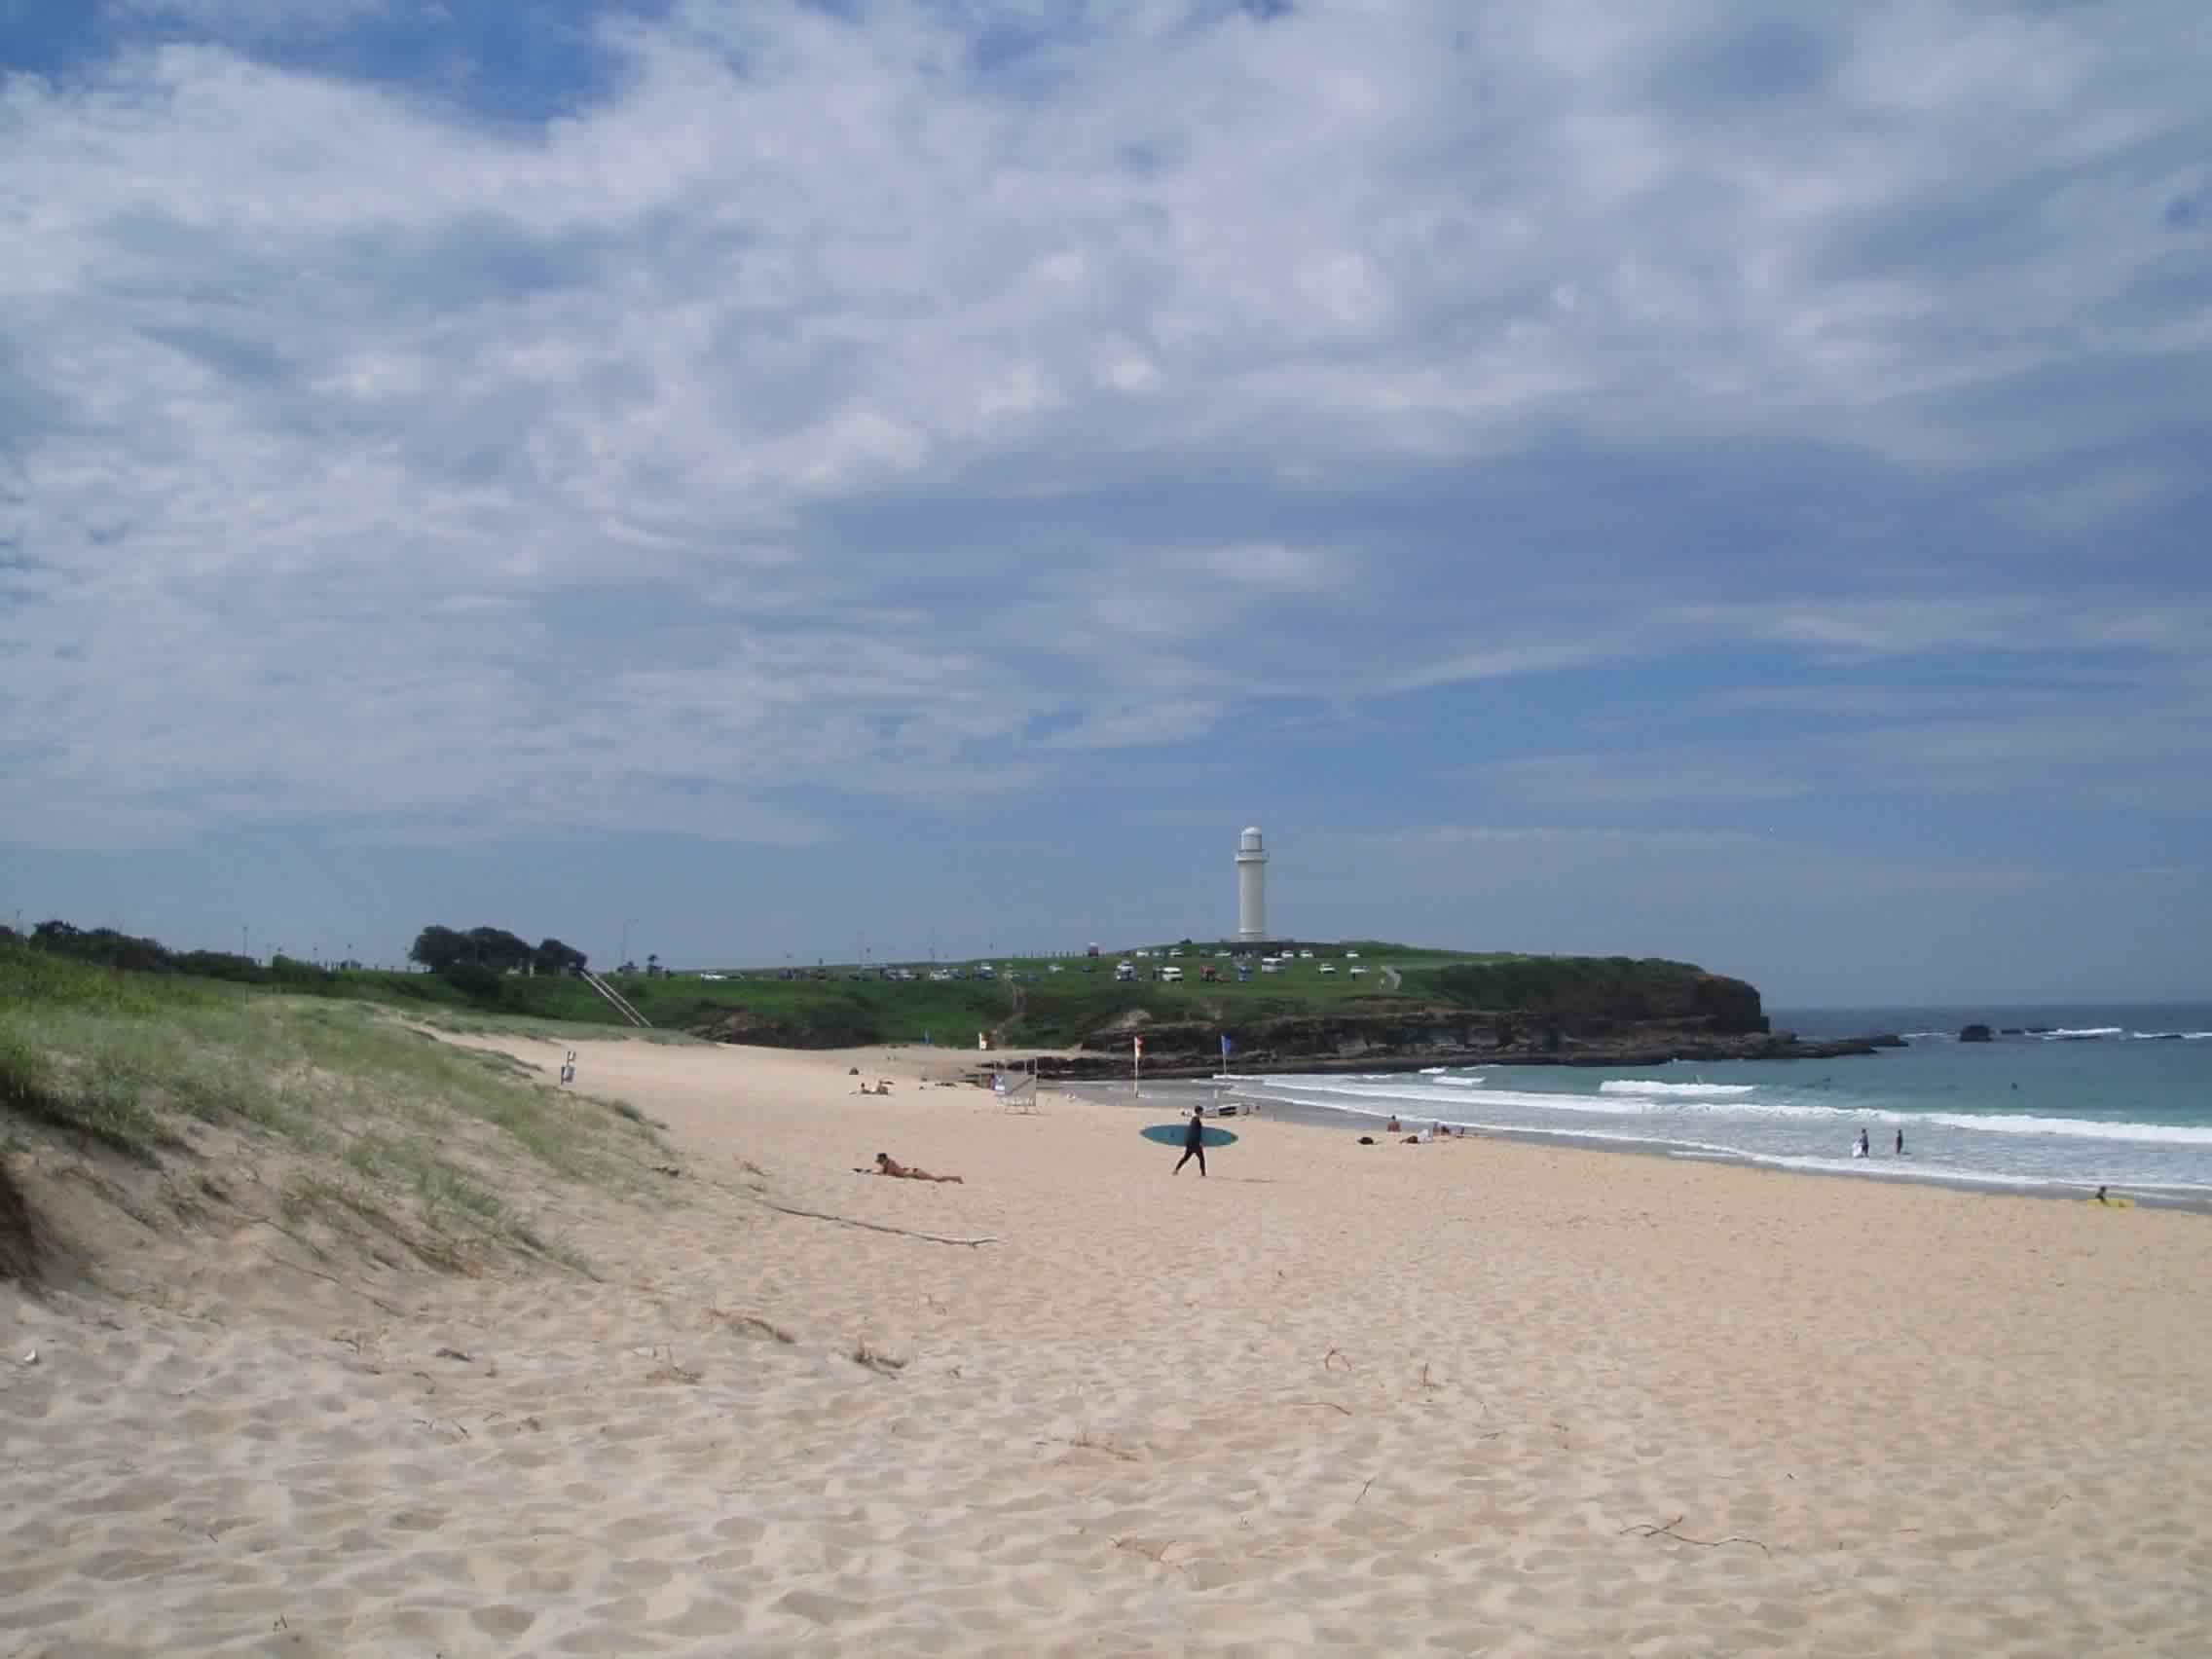 Wgong Beach